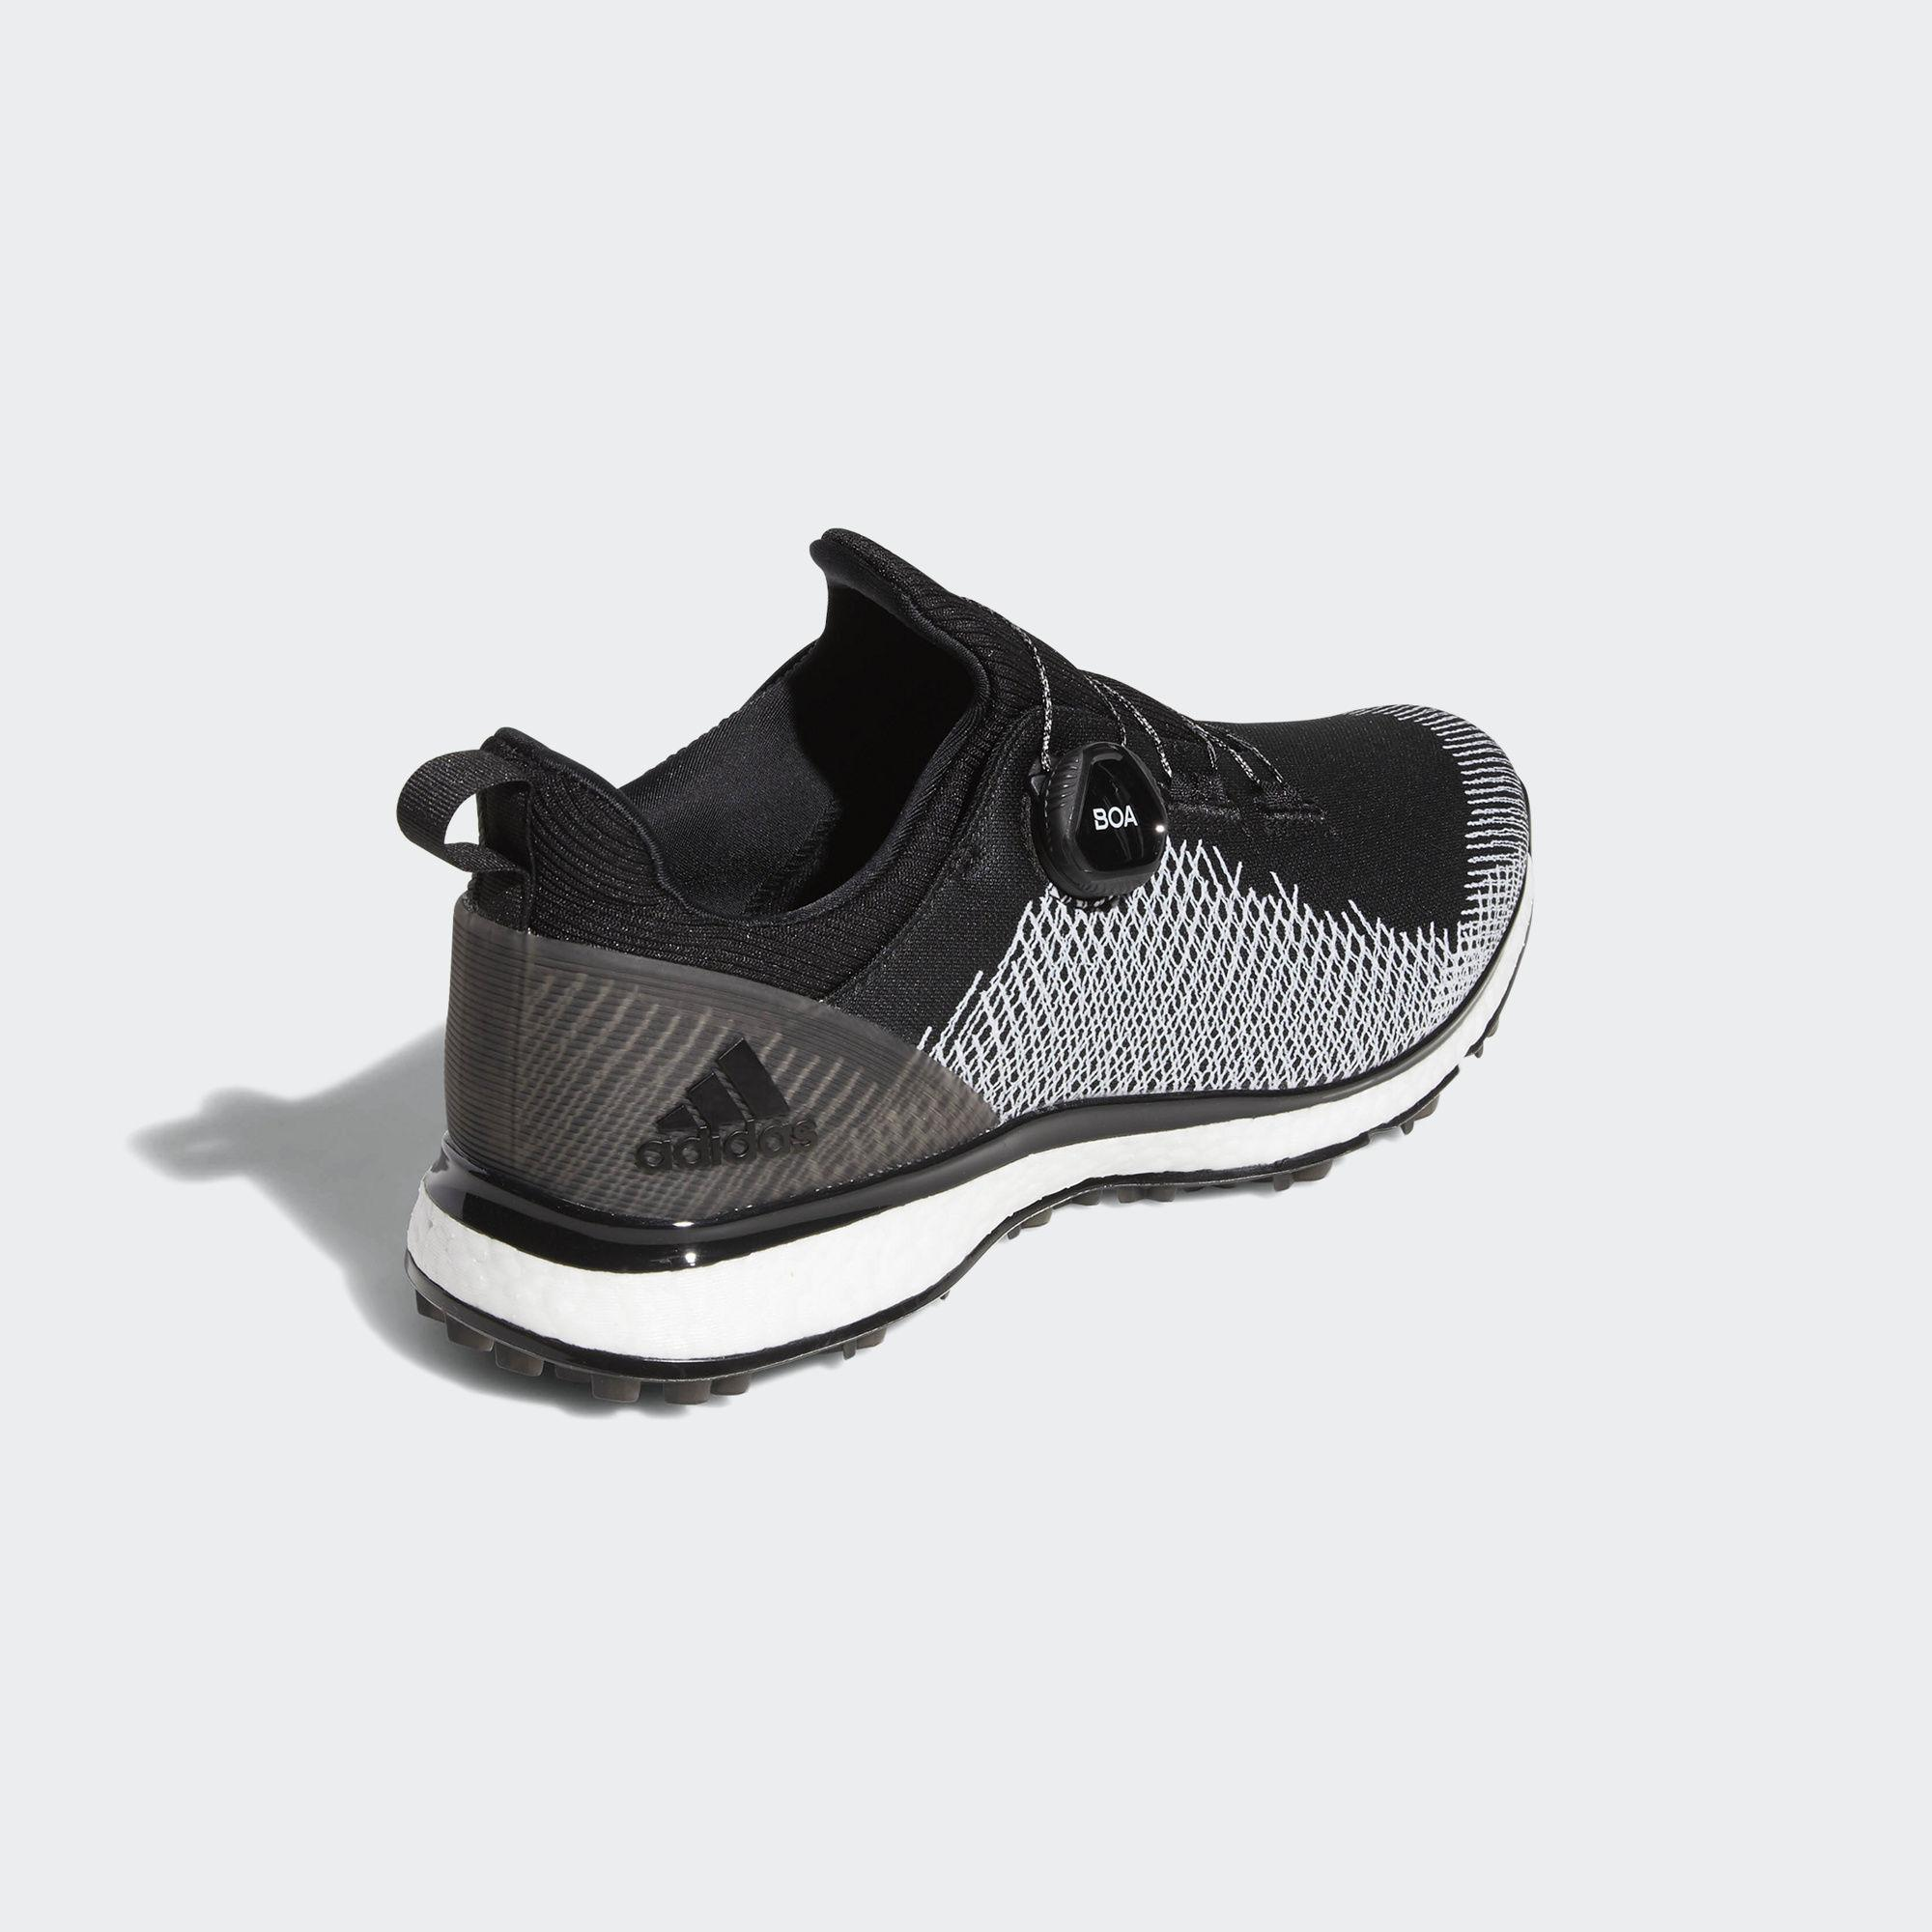 fd592c54b087 adidas Forgefiber Boa Shoes in Black for Men - Lyst